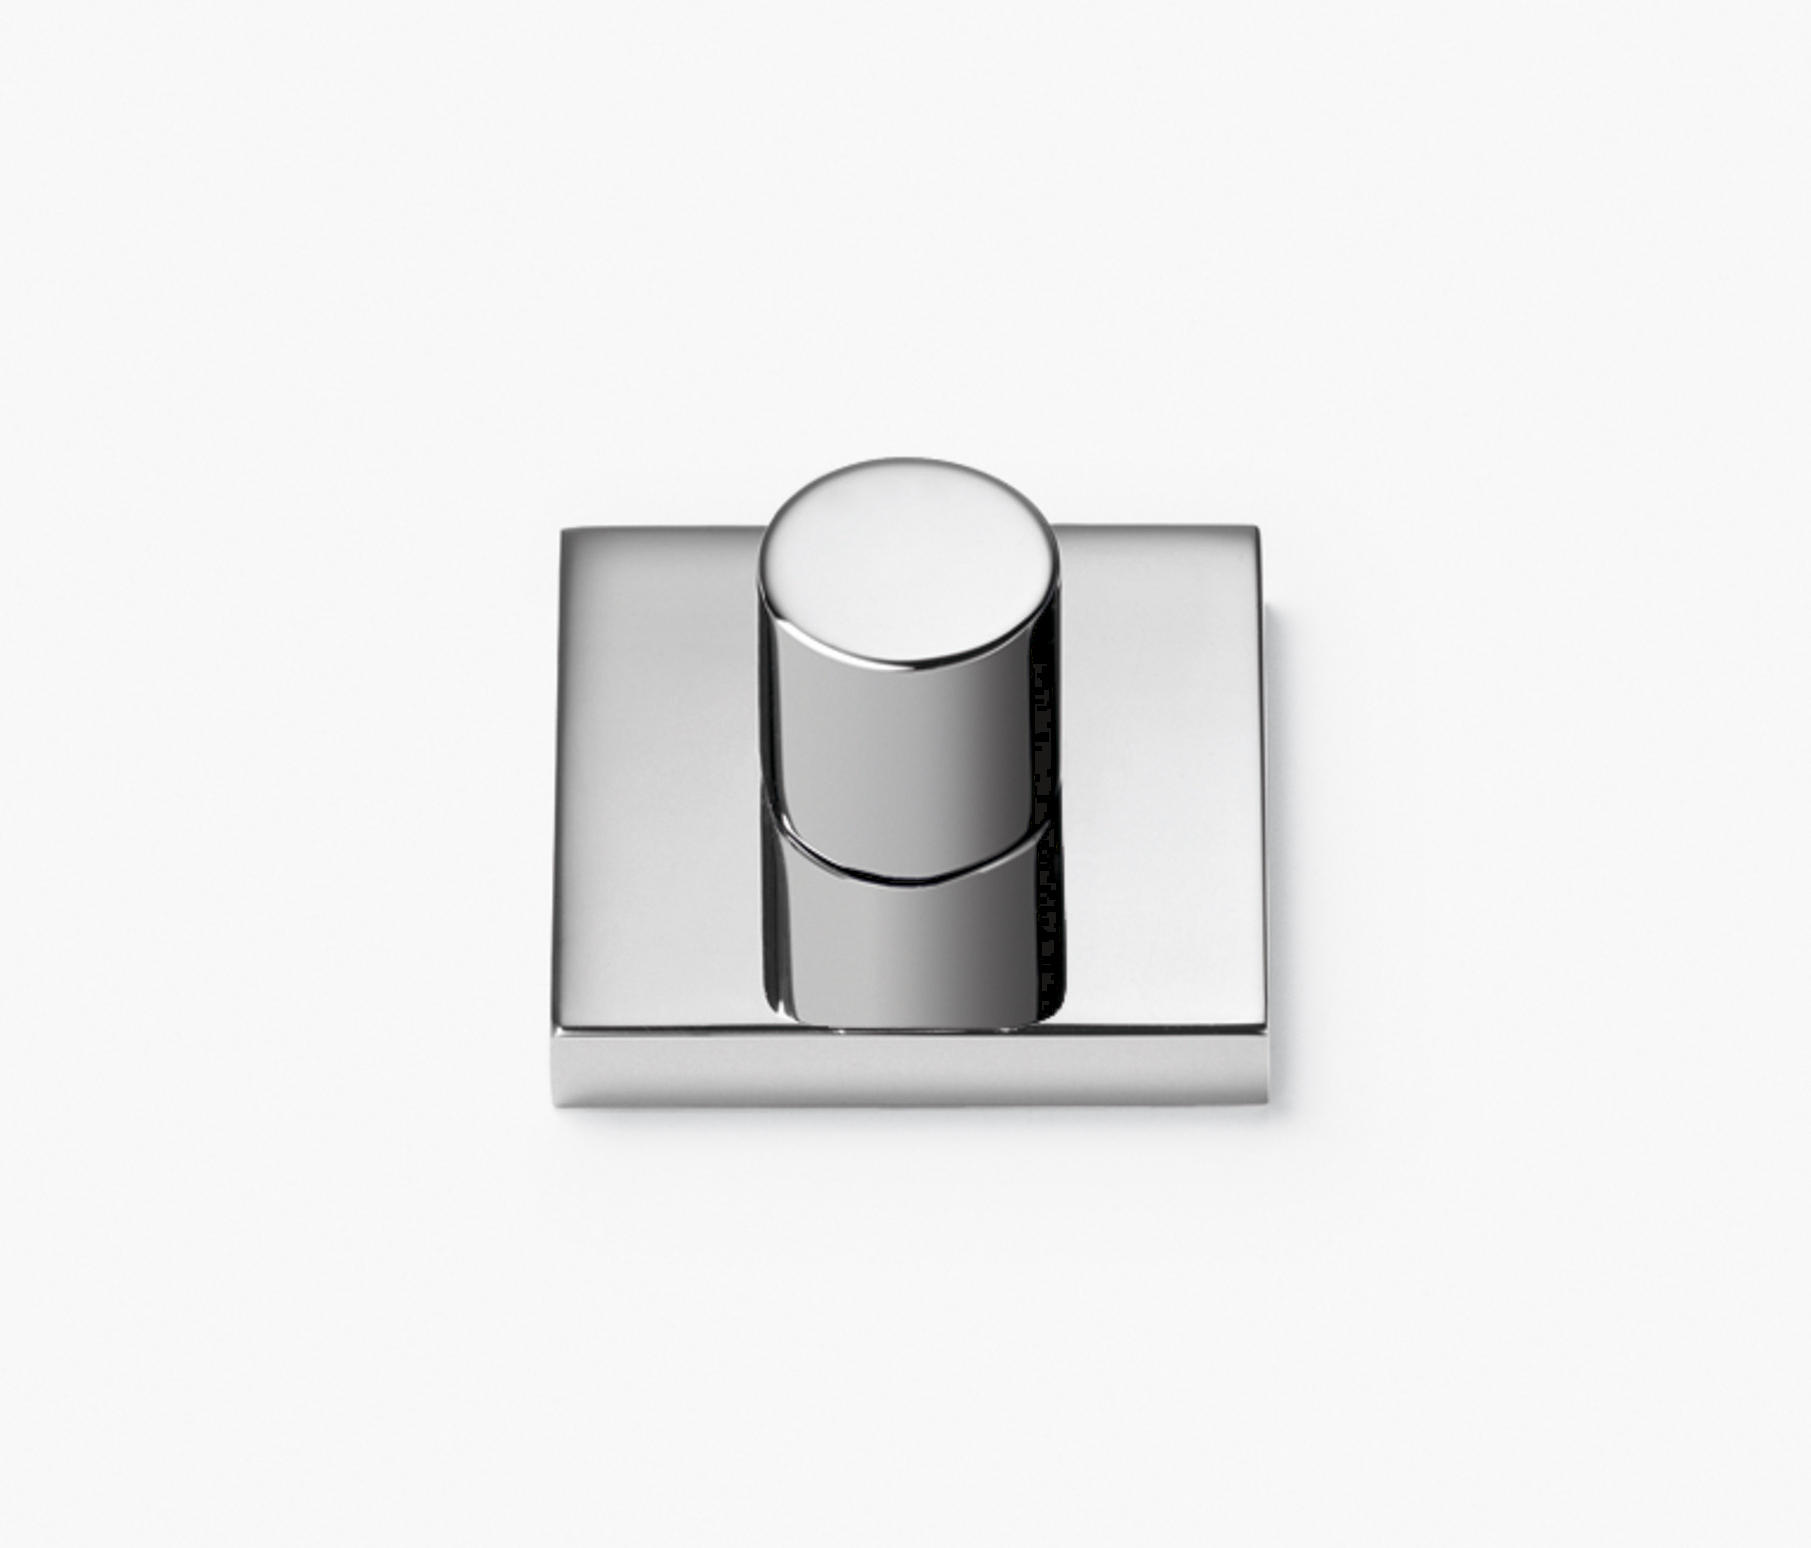 symetrics robinet lat ral accessoires grifer a de ba o de dornbracht architonic. Black Bedroom Furniture Sets. Home Design Ideas